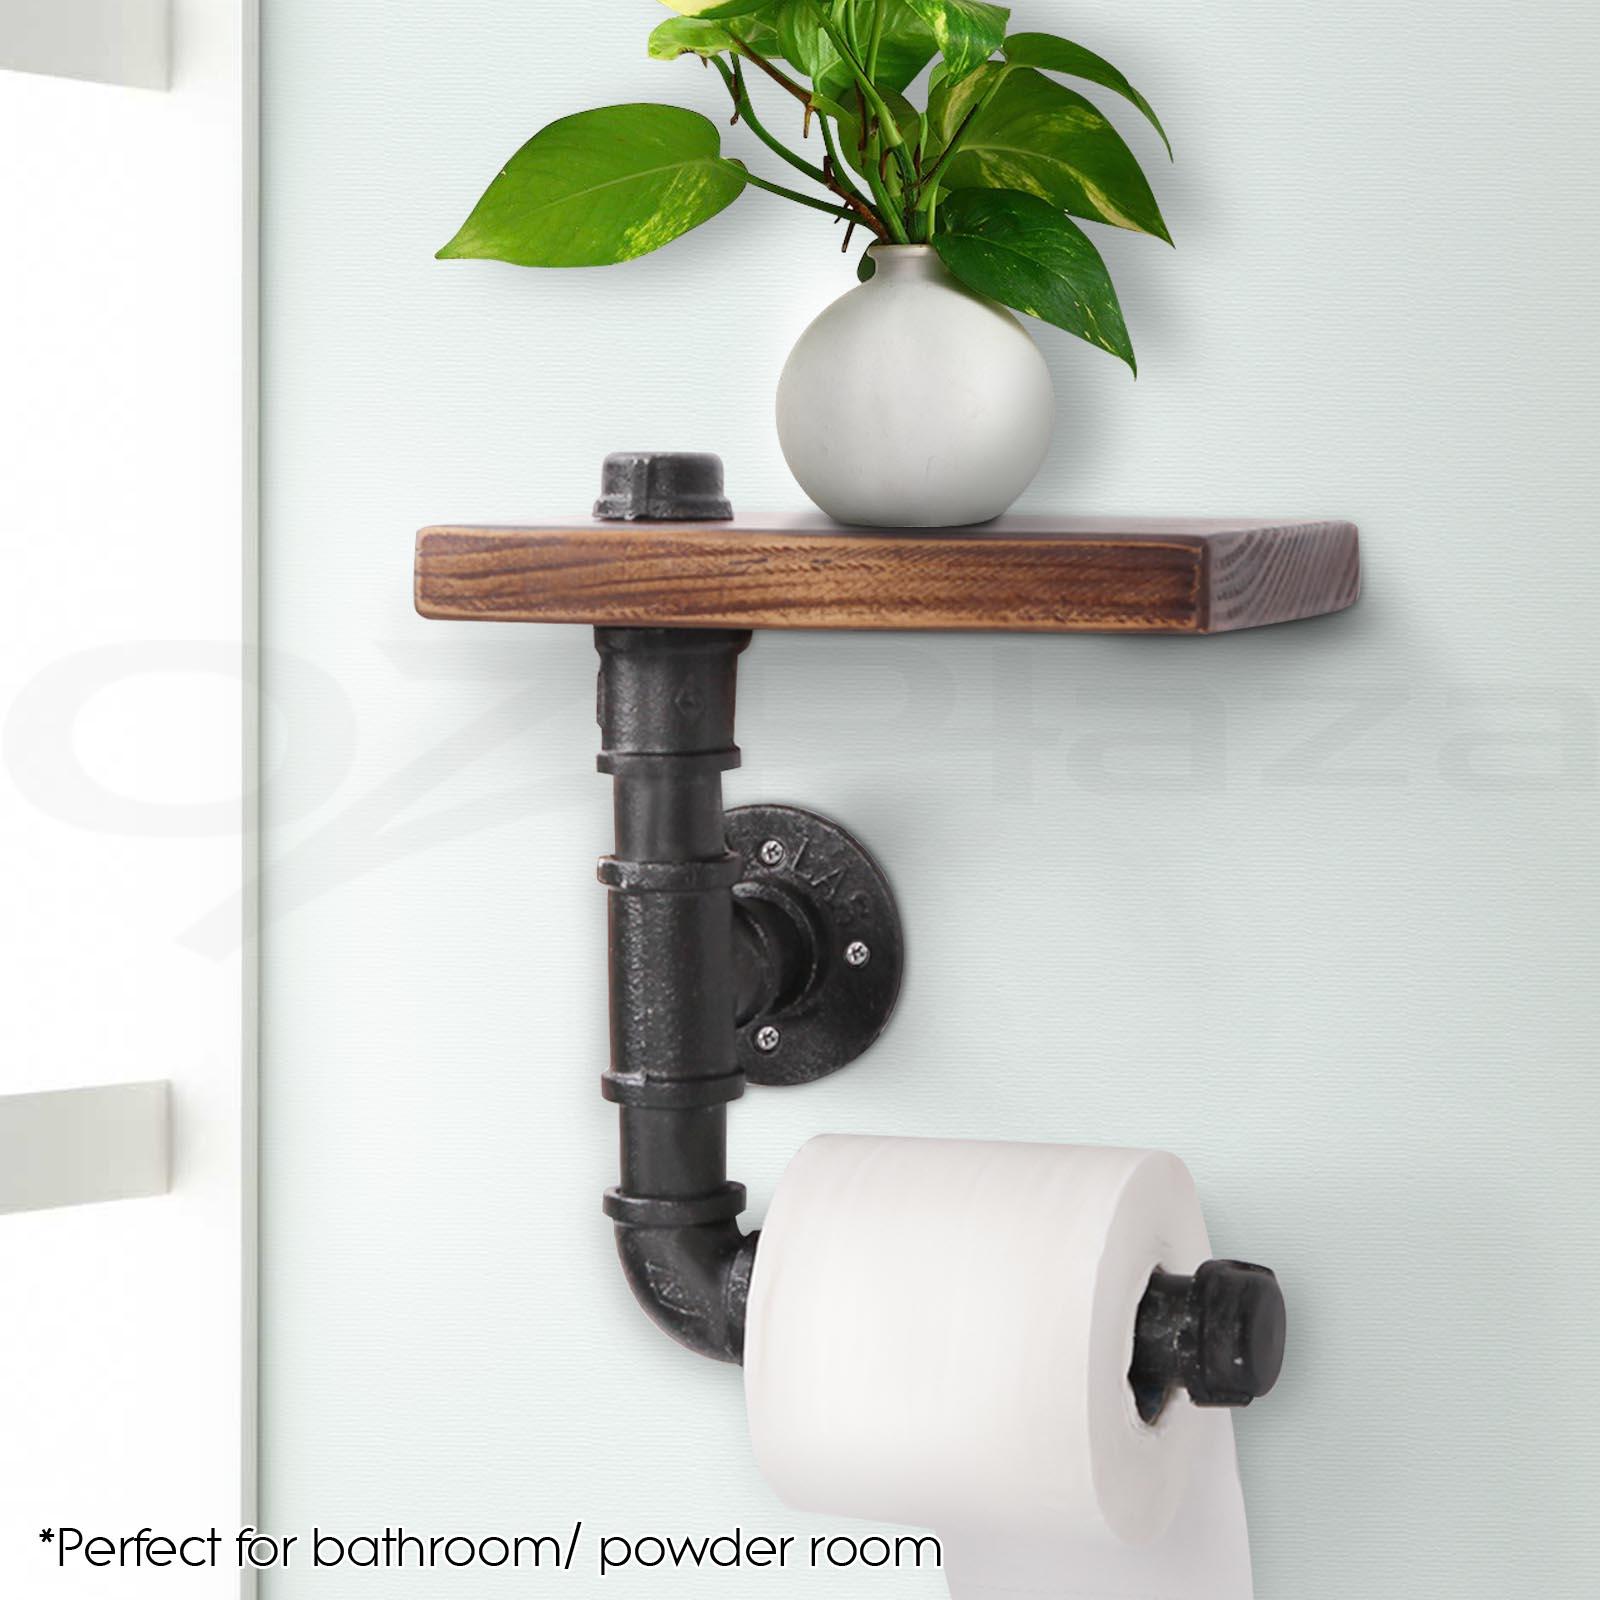 Diy Floating Shelves For Bathroom: Rustic Industrial DIY Bathroom Paper Holder Pipe Vintage